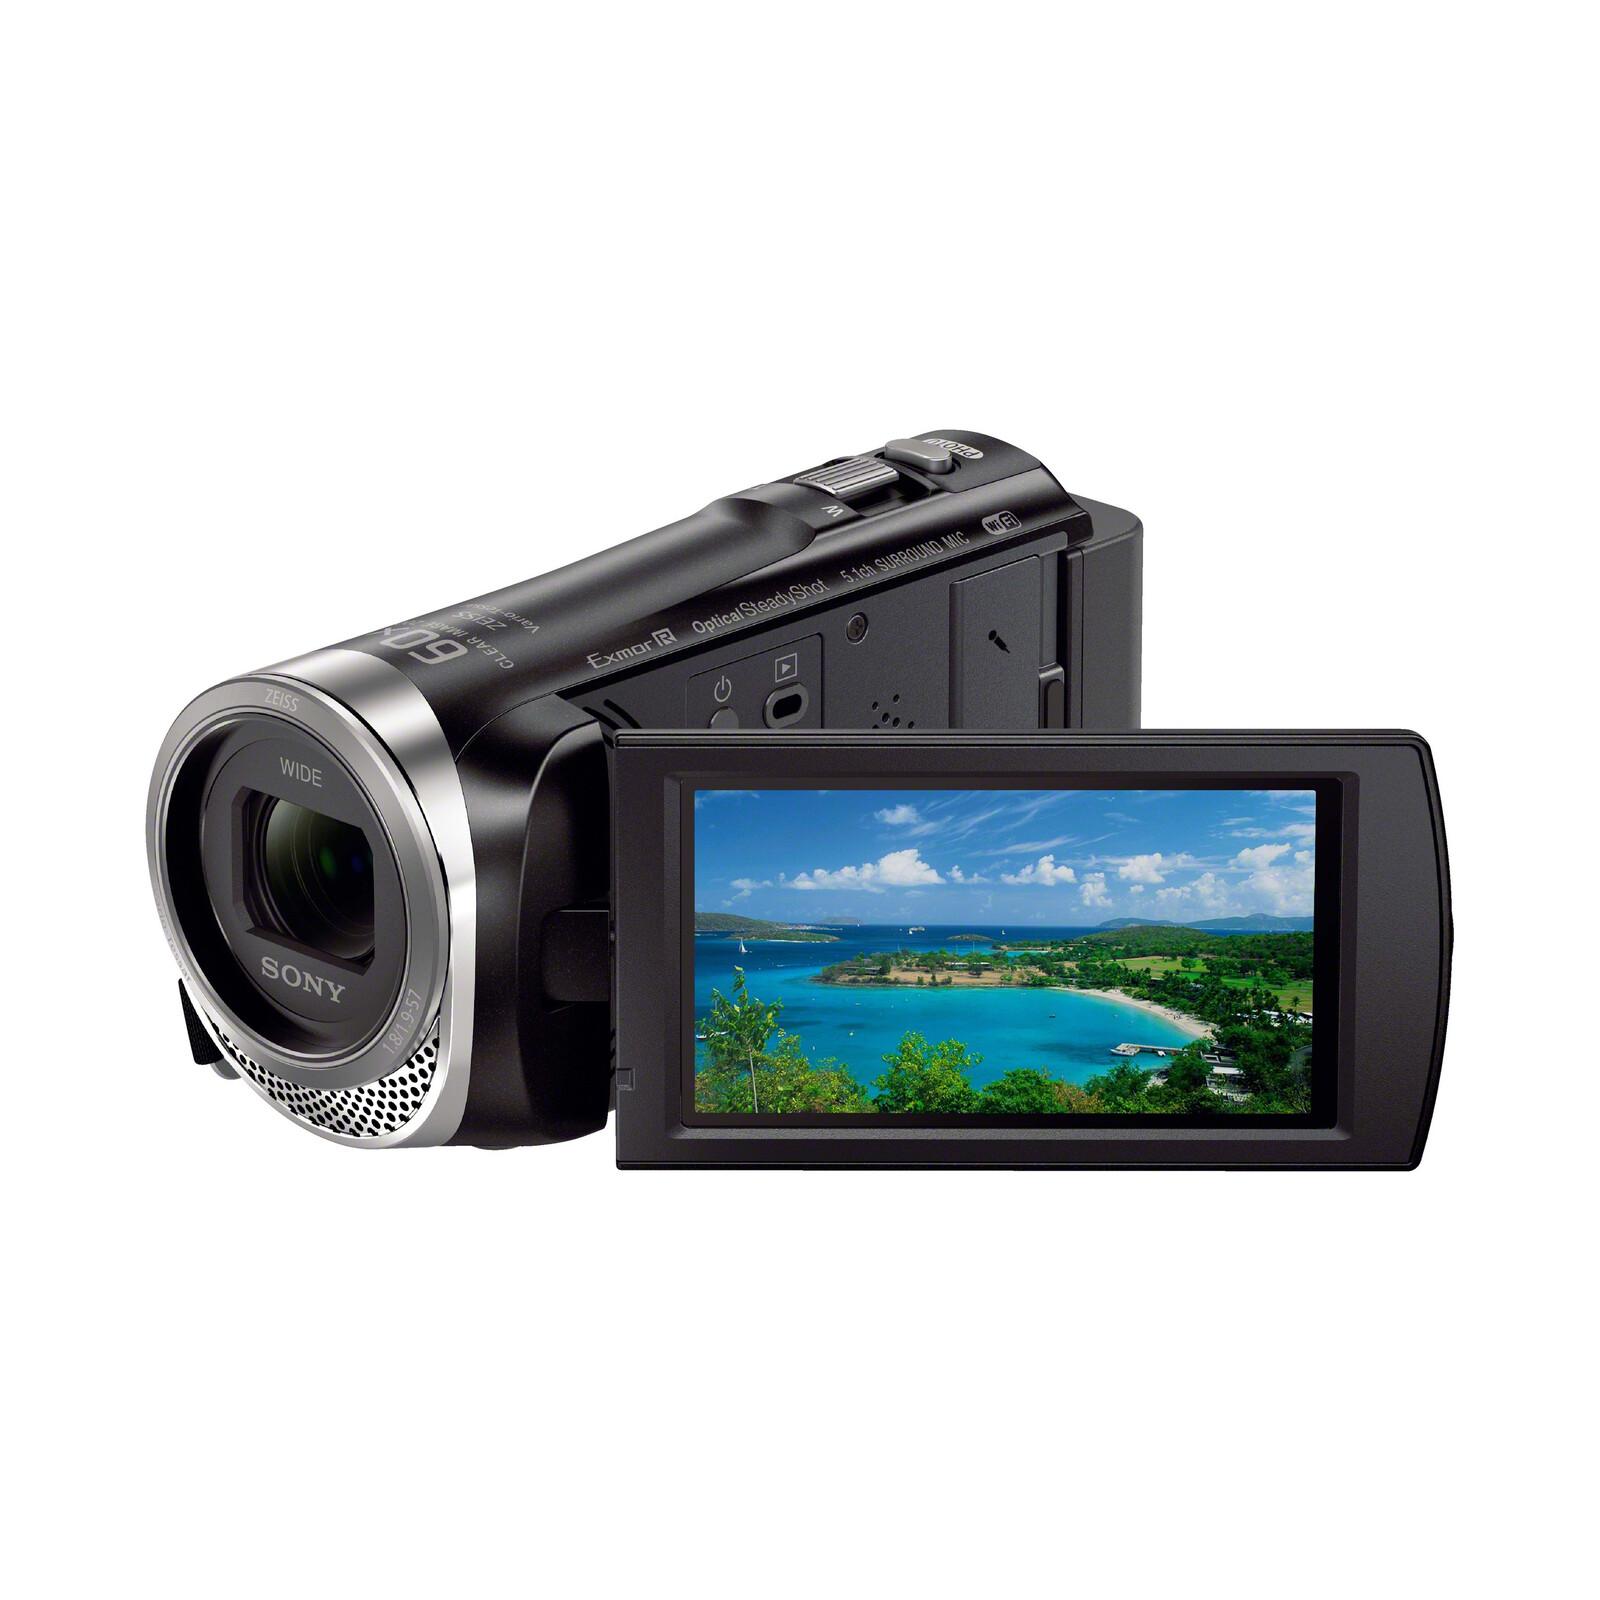 Sony HDR-CX450B HD Camcorder